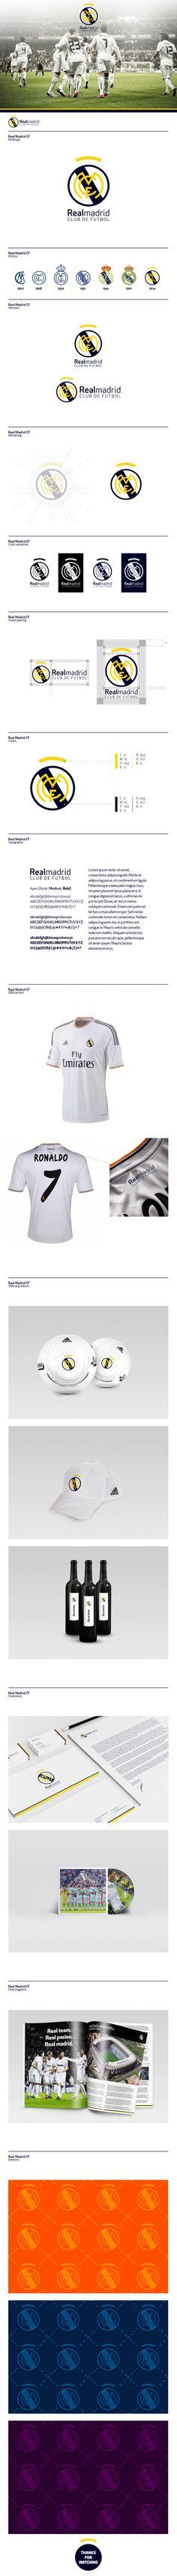 Real Madrid Logo Redesign on Behance